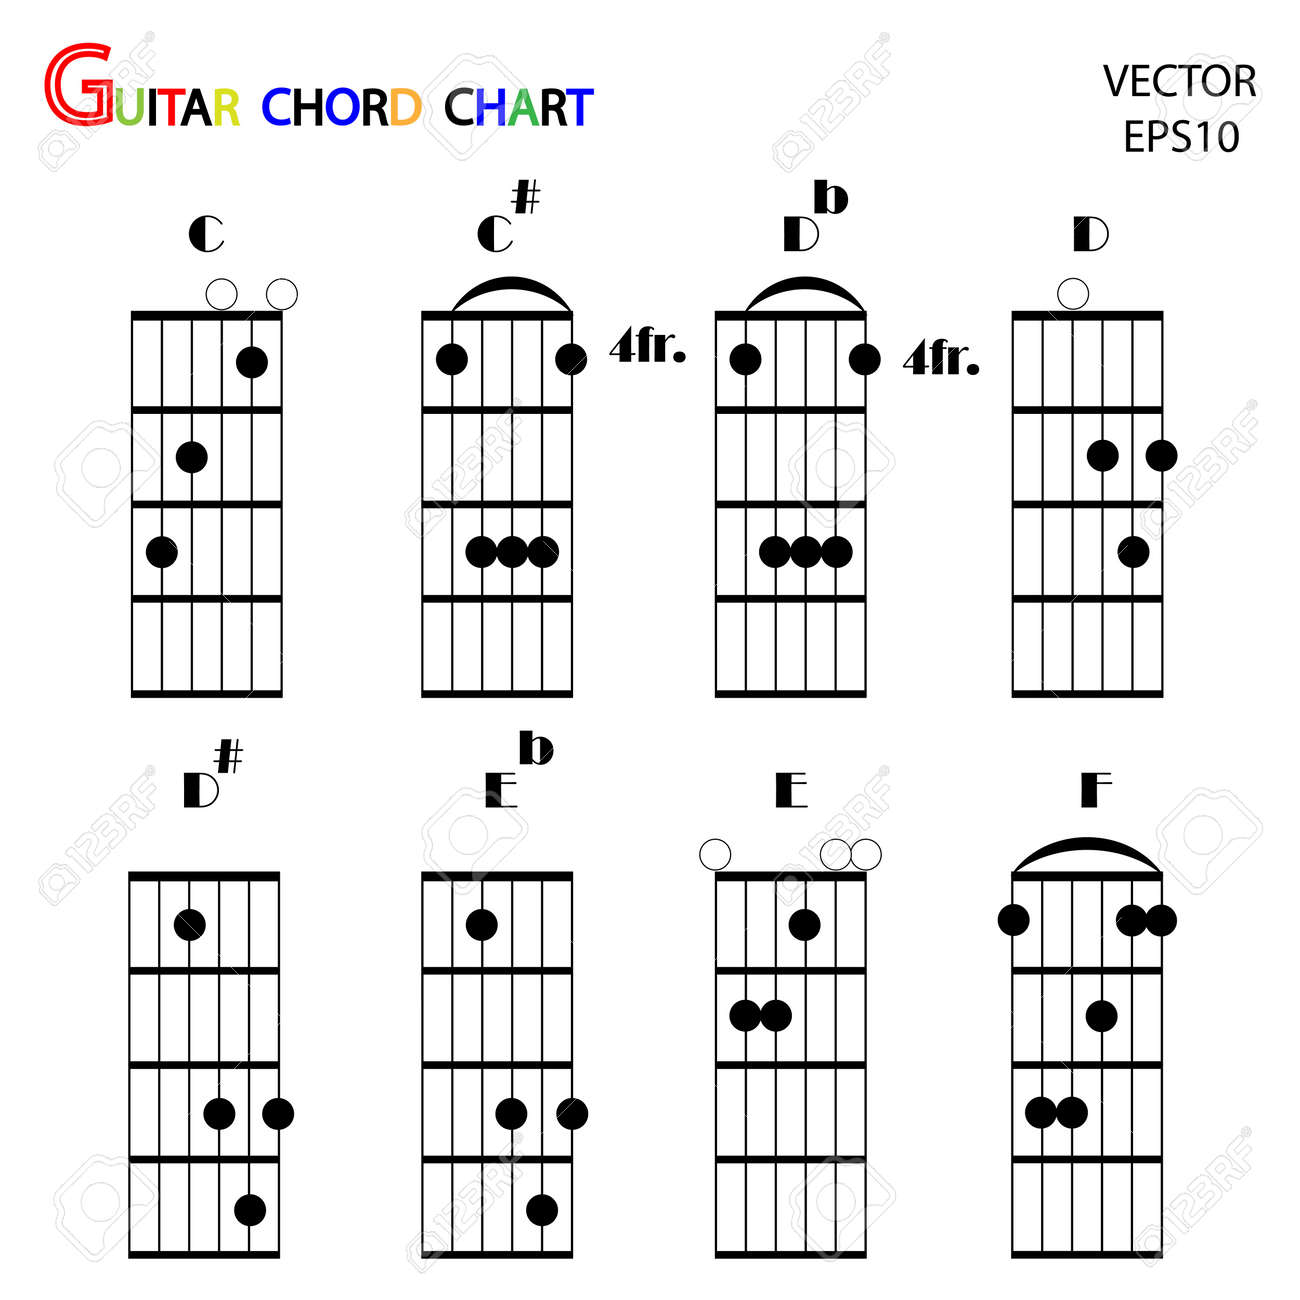 Basic Guitar Chords Tab Guitar Chordsvector Royalty Free Cliparts